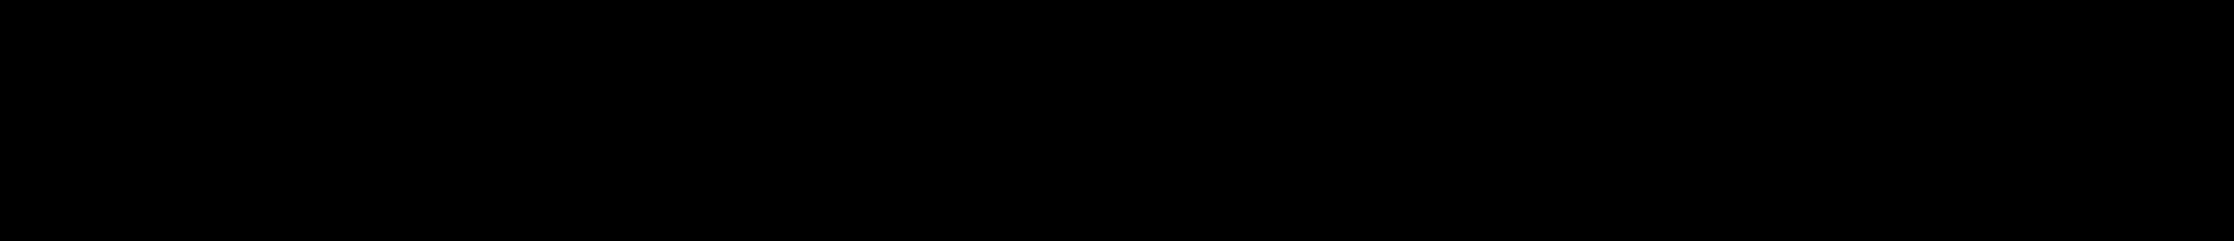 Museo Sans Cyrillic 700